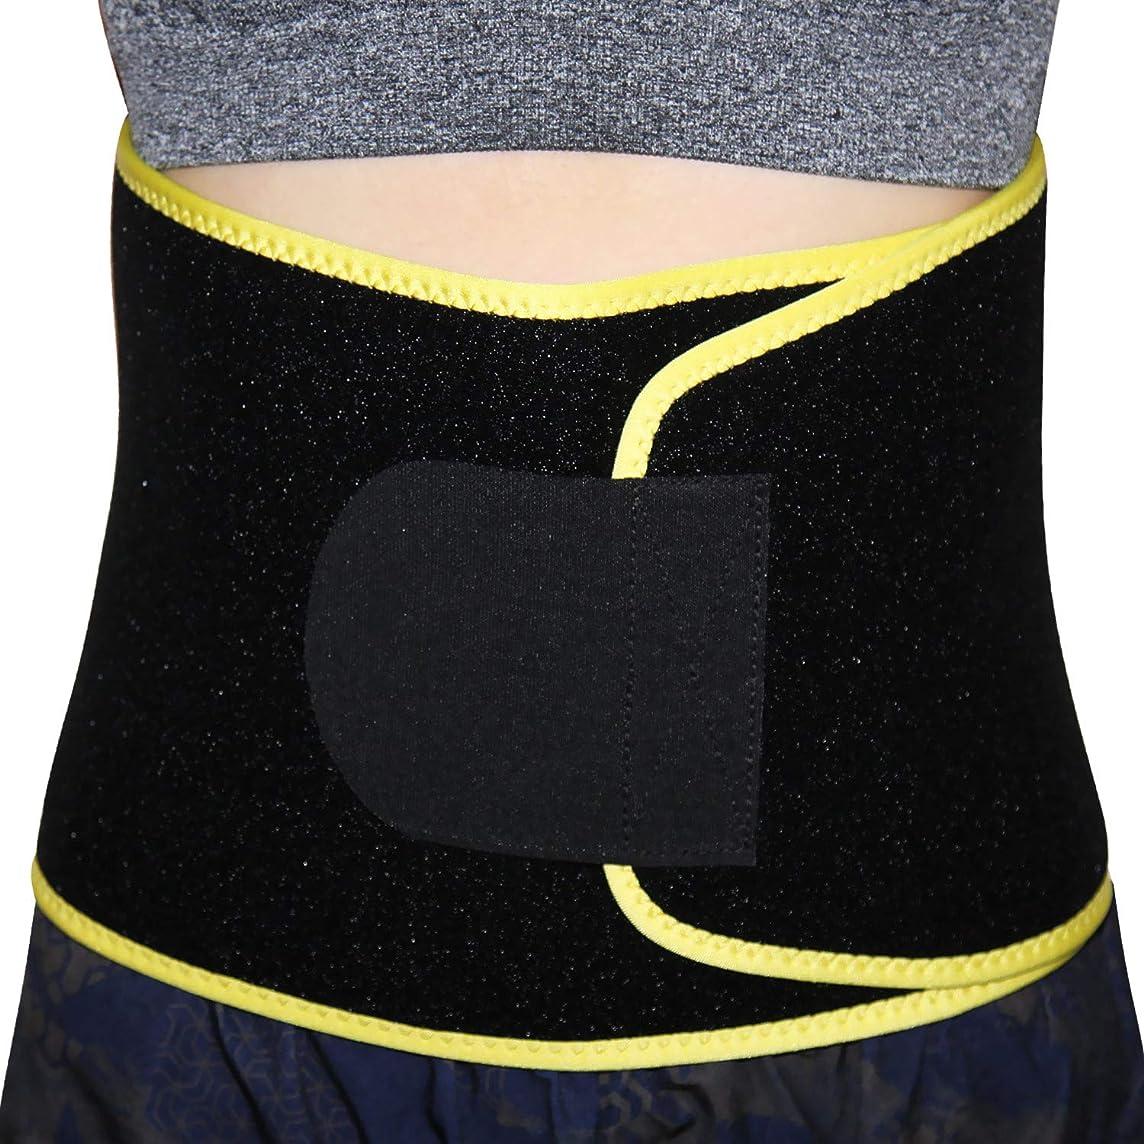 Voila Reve Waist Trimmer - Premium Wide Grip Slimming Belt Accelerates Weight Loss, Anti Allergy - Lower Back & Lumbar Support for Men & Women